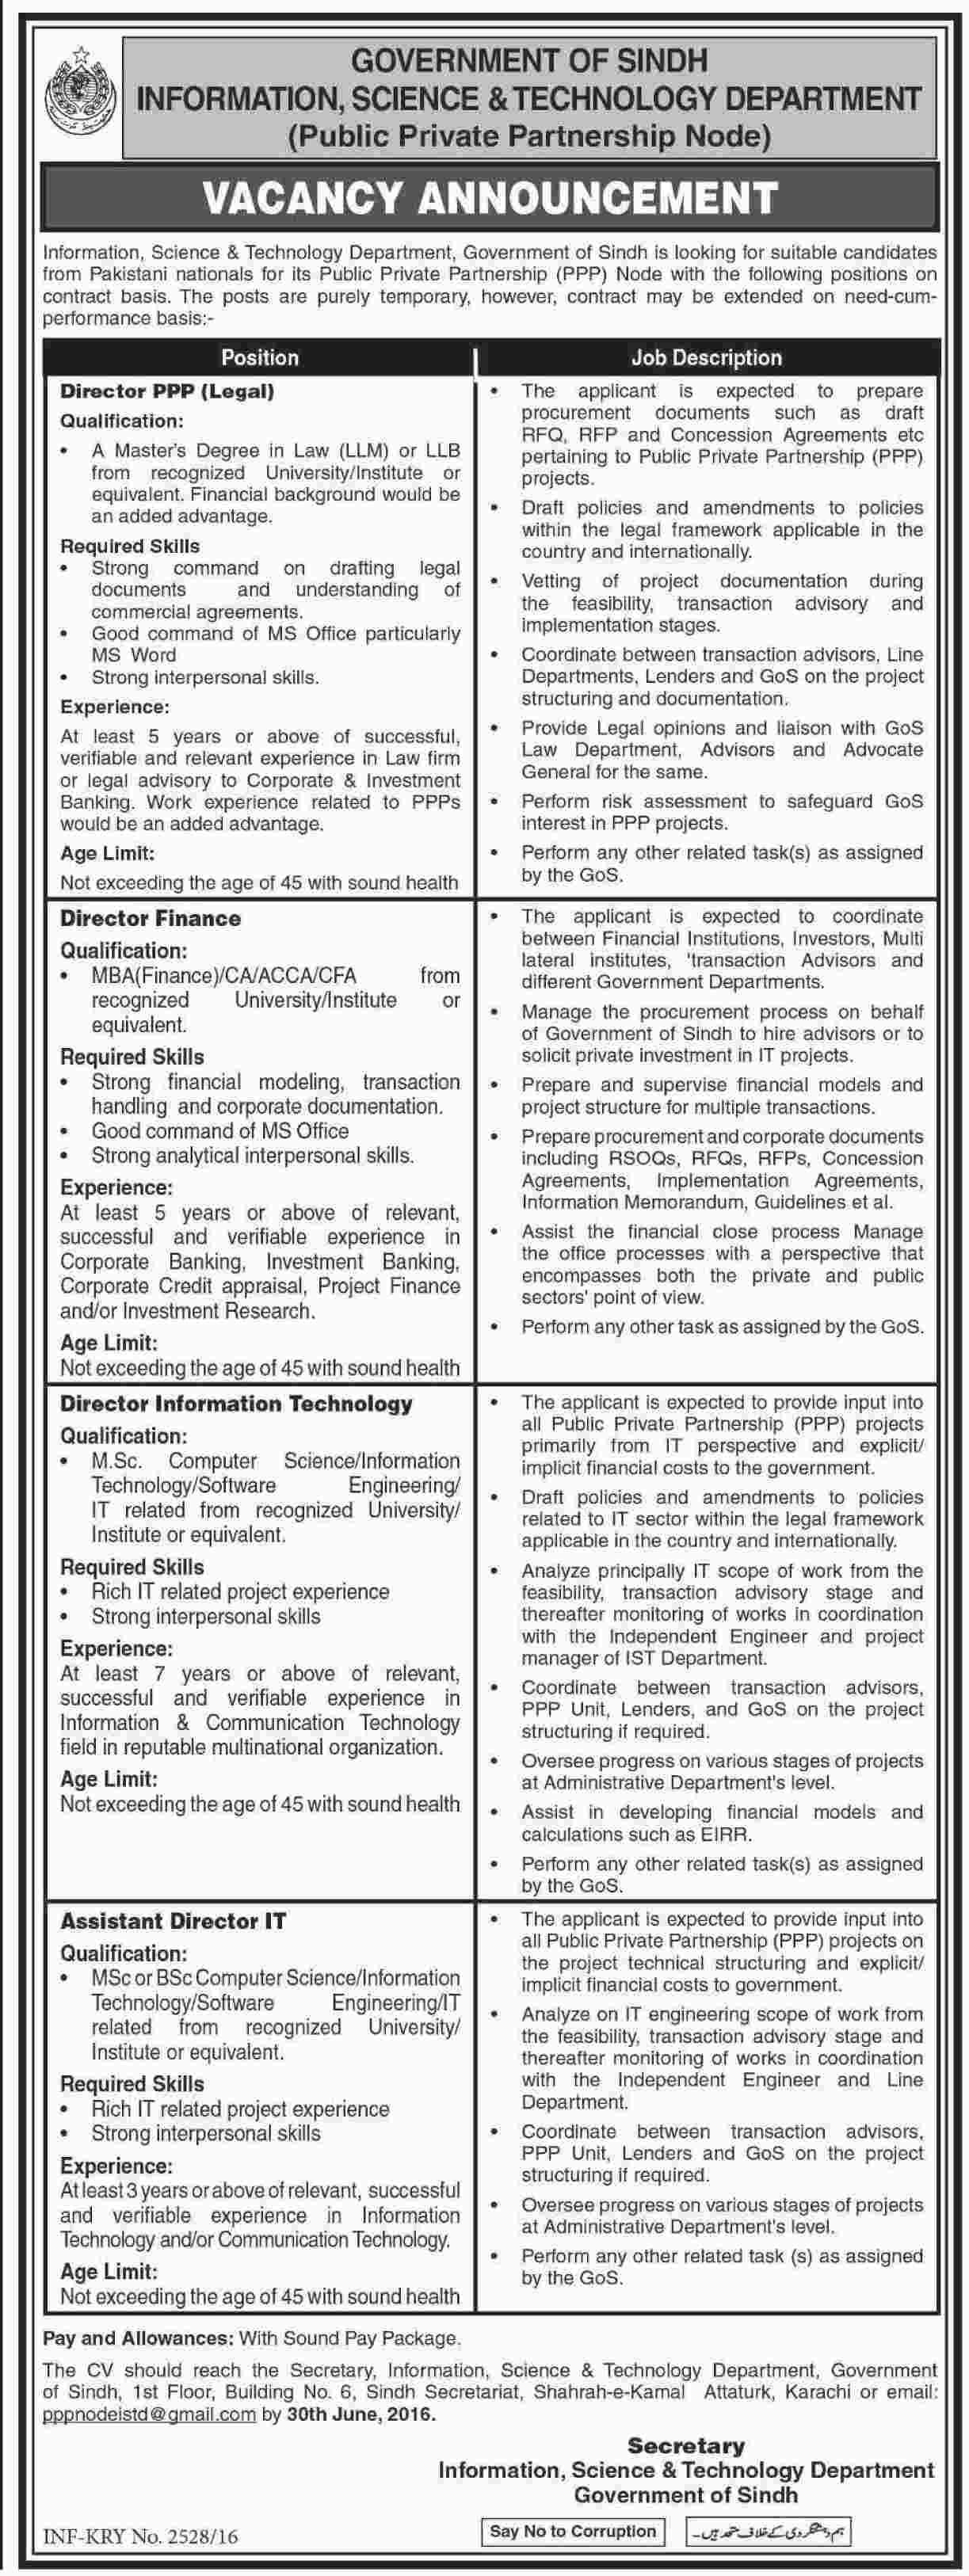 sindh govt information science technology department jobs sindh govt dawn 11 06 2016 006 007